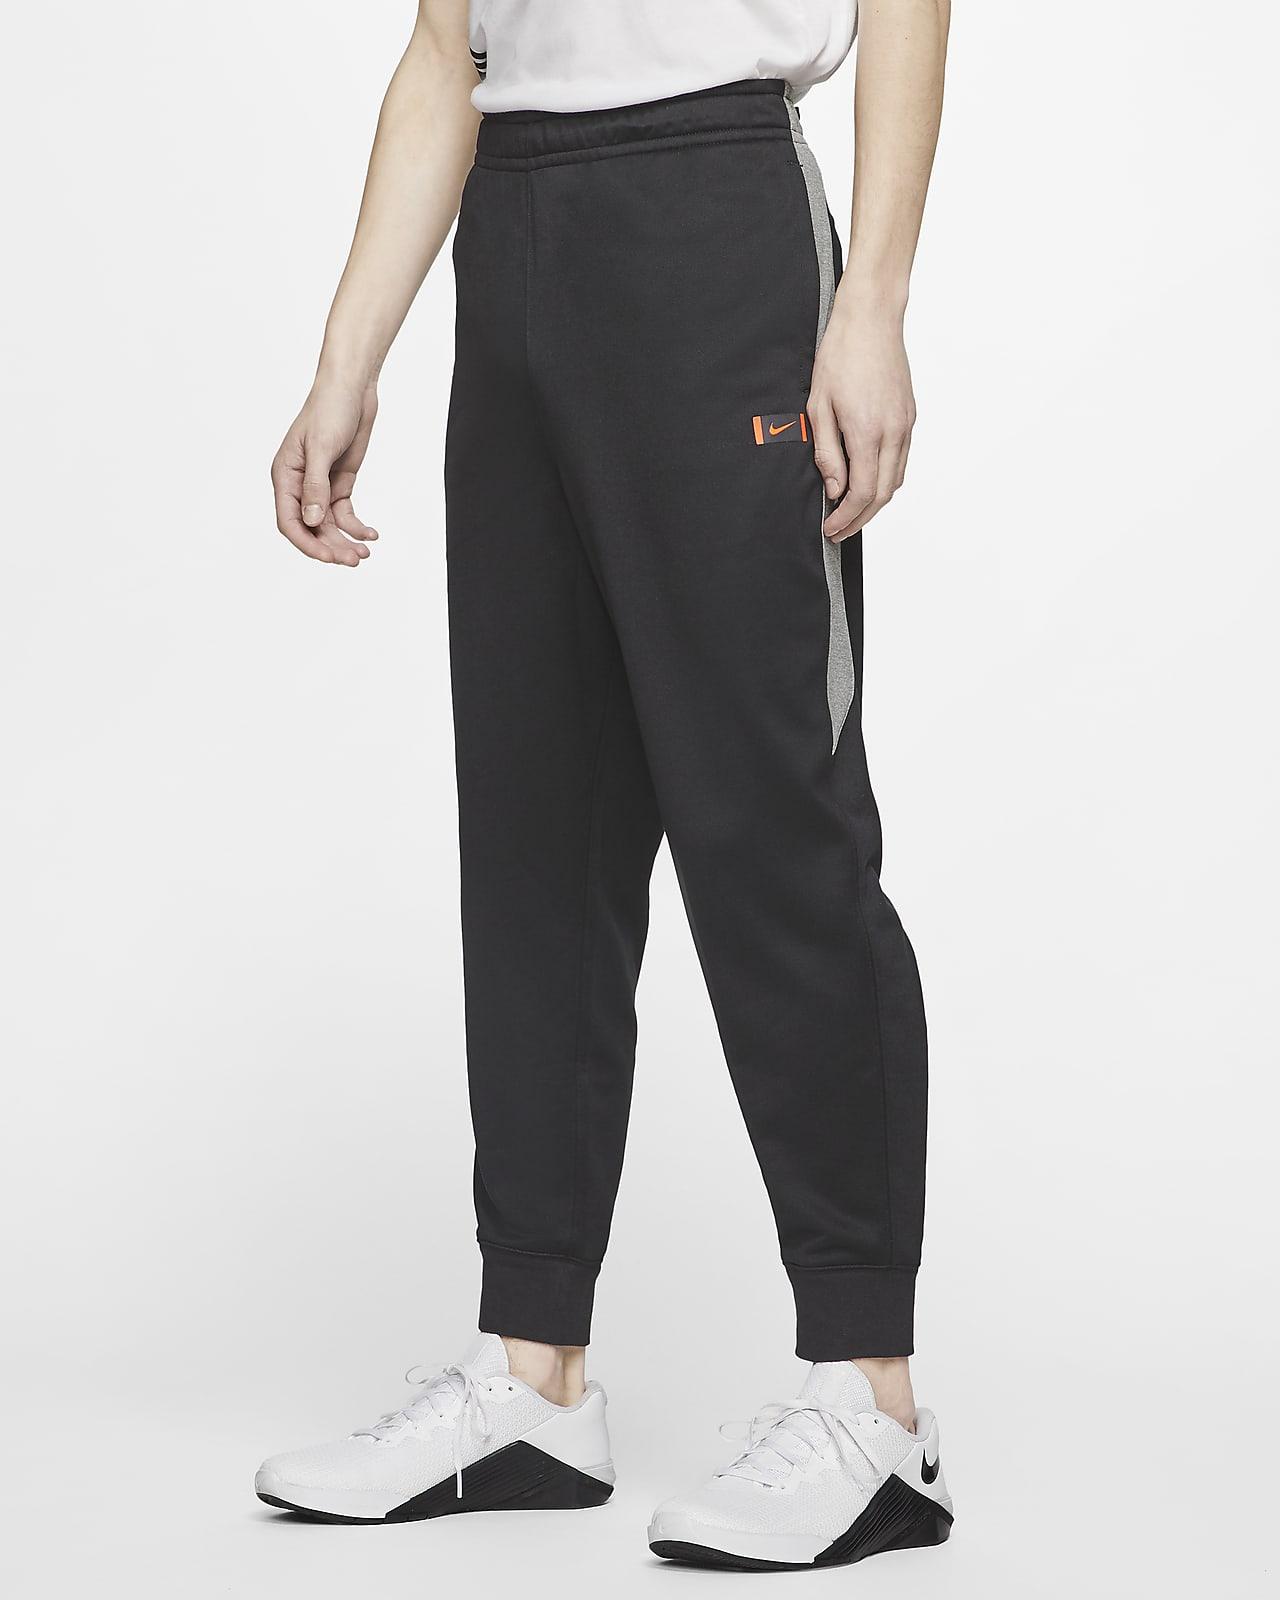 Nike Dri-FIT Men's Football Pants